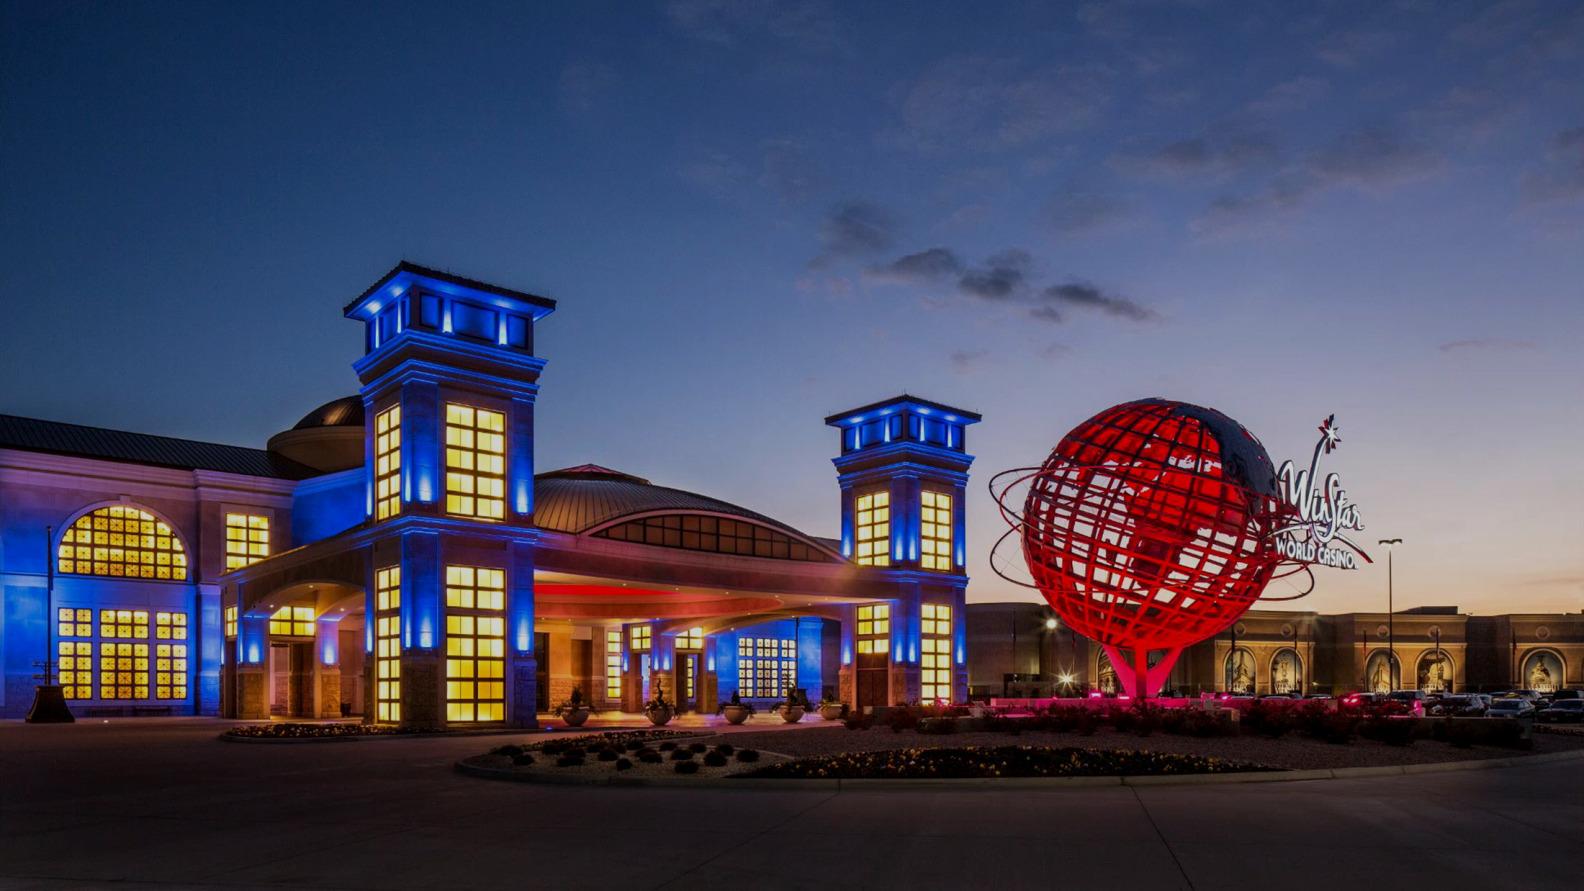 Hotel gambling profits value global gambling industry